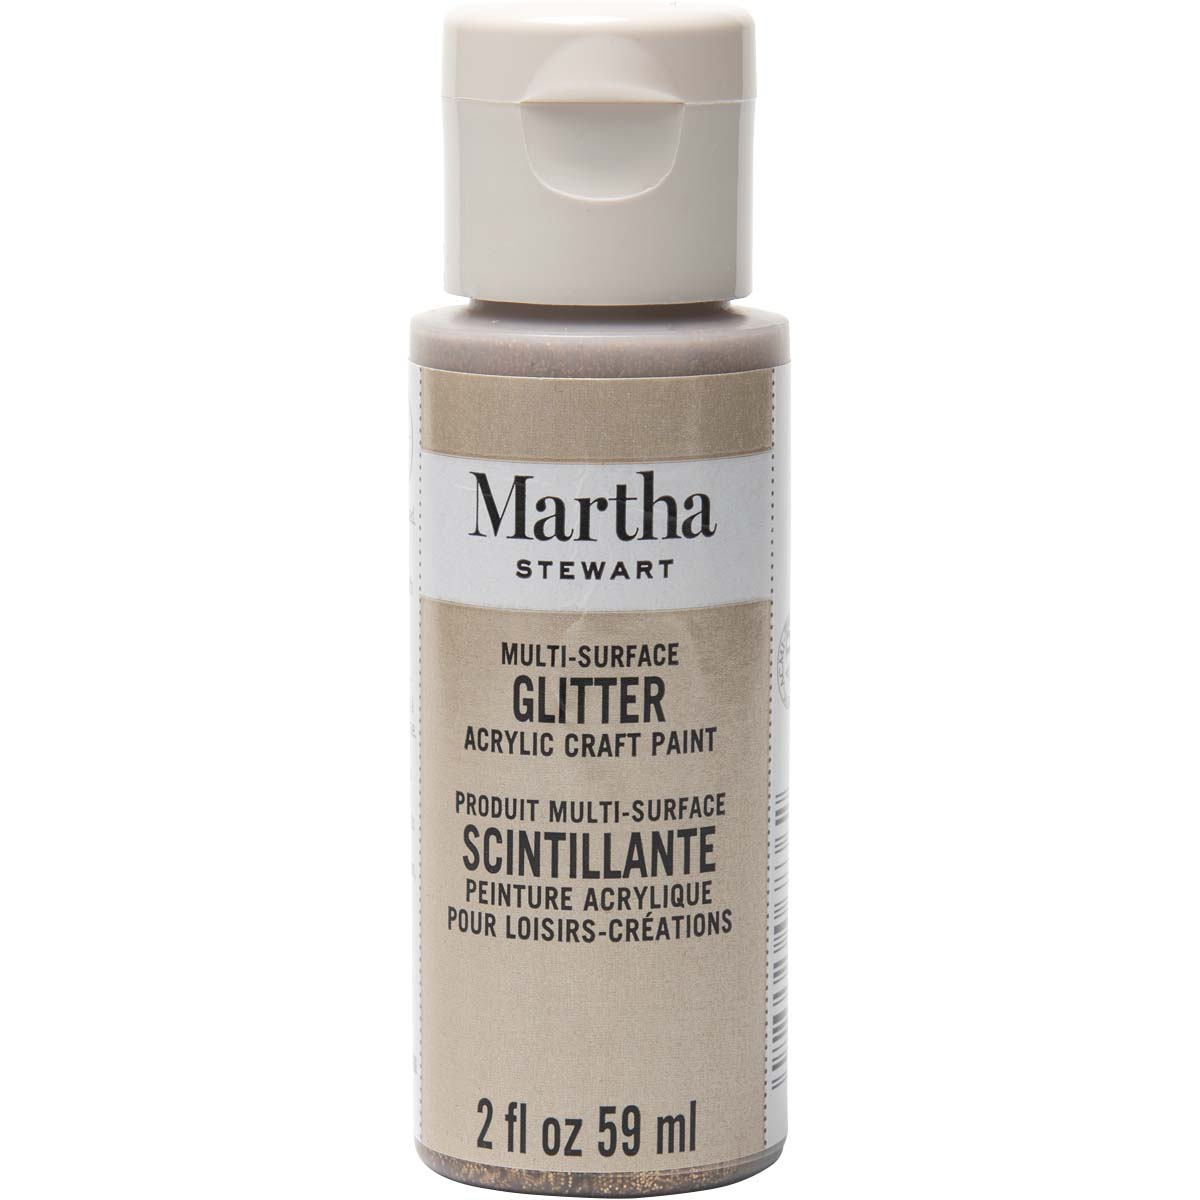 Martha Stewart® 2oz Multi-Surface Glitter Acrylic Craft Paint - Smoky Quartz